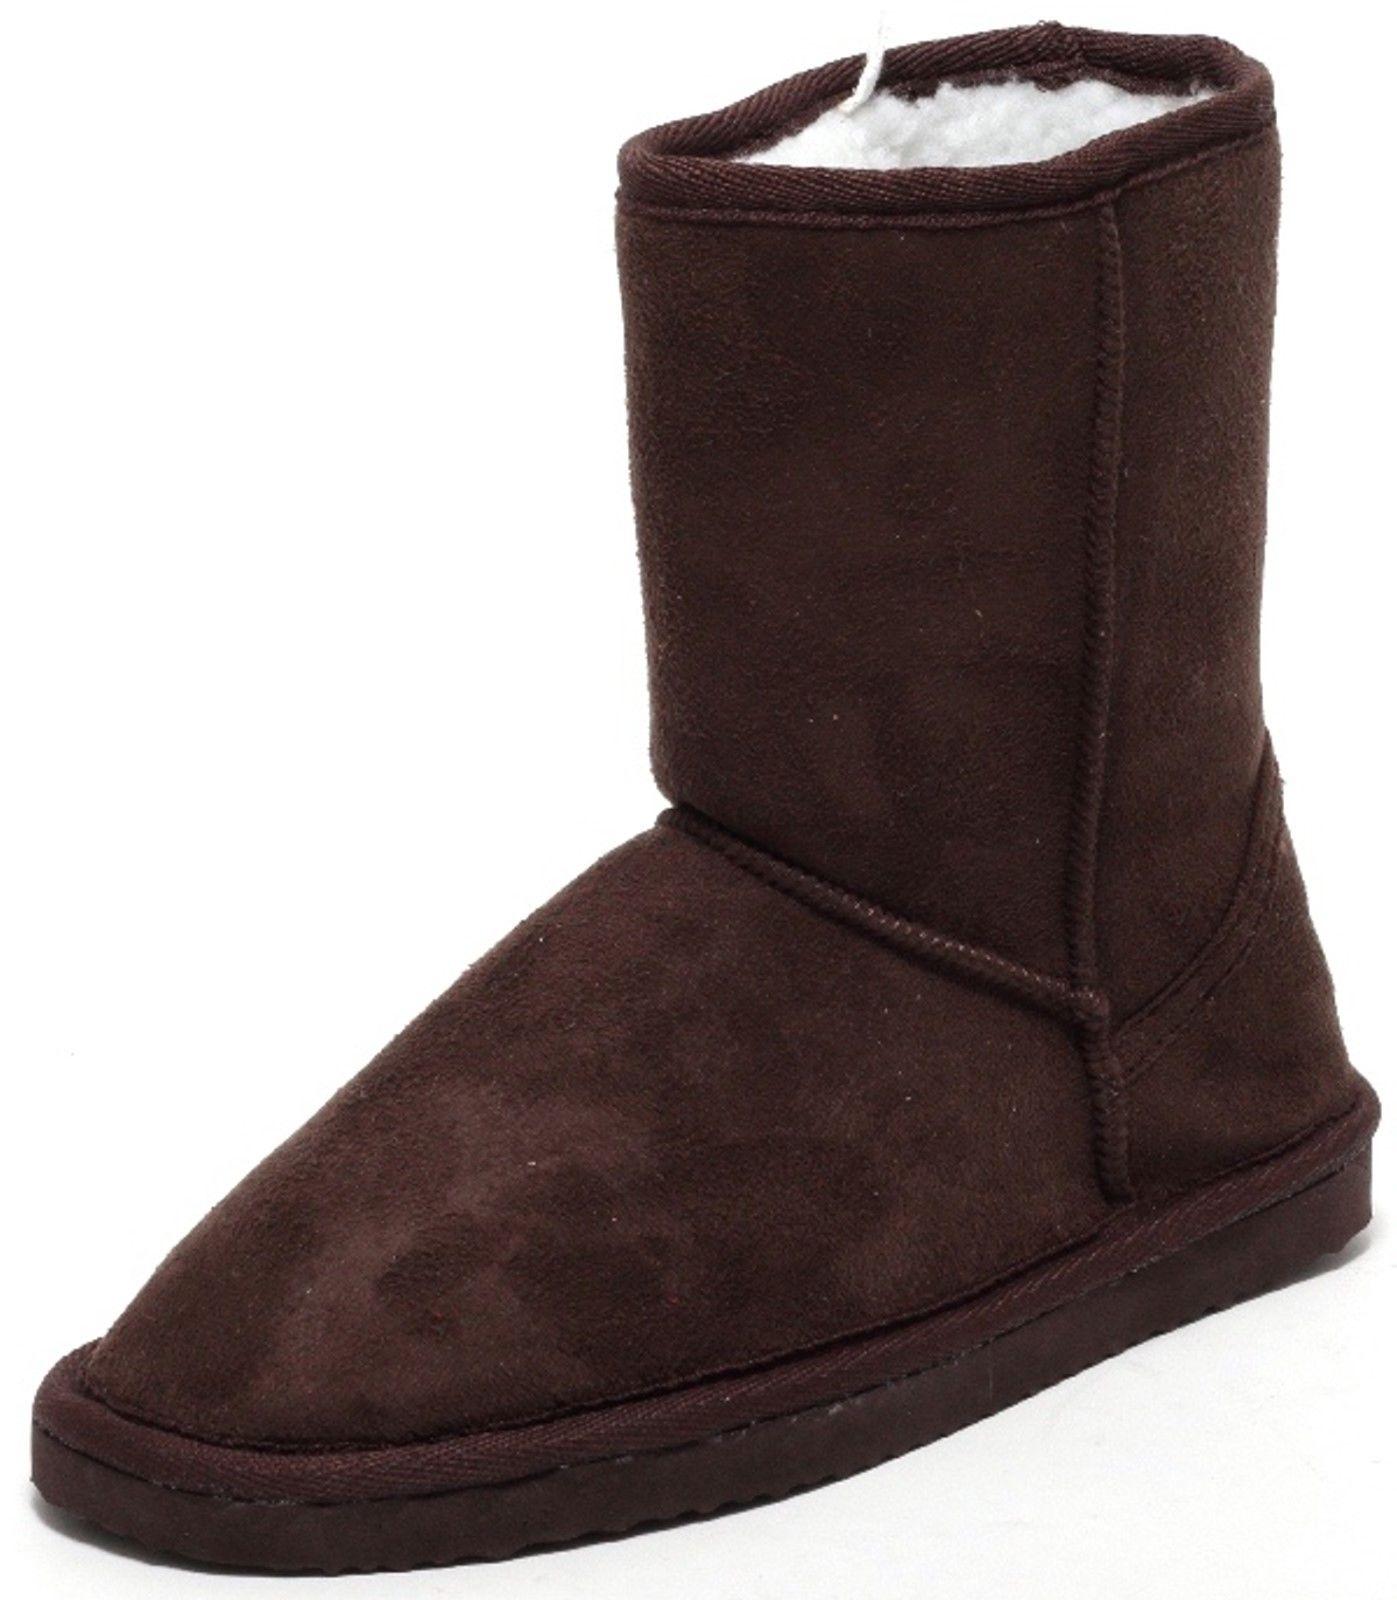 damen stiefel gr 37 40 winterstiefel fellstiefel boots. Black Bedroom Furniture Sets. Home Design Ideas